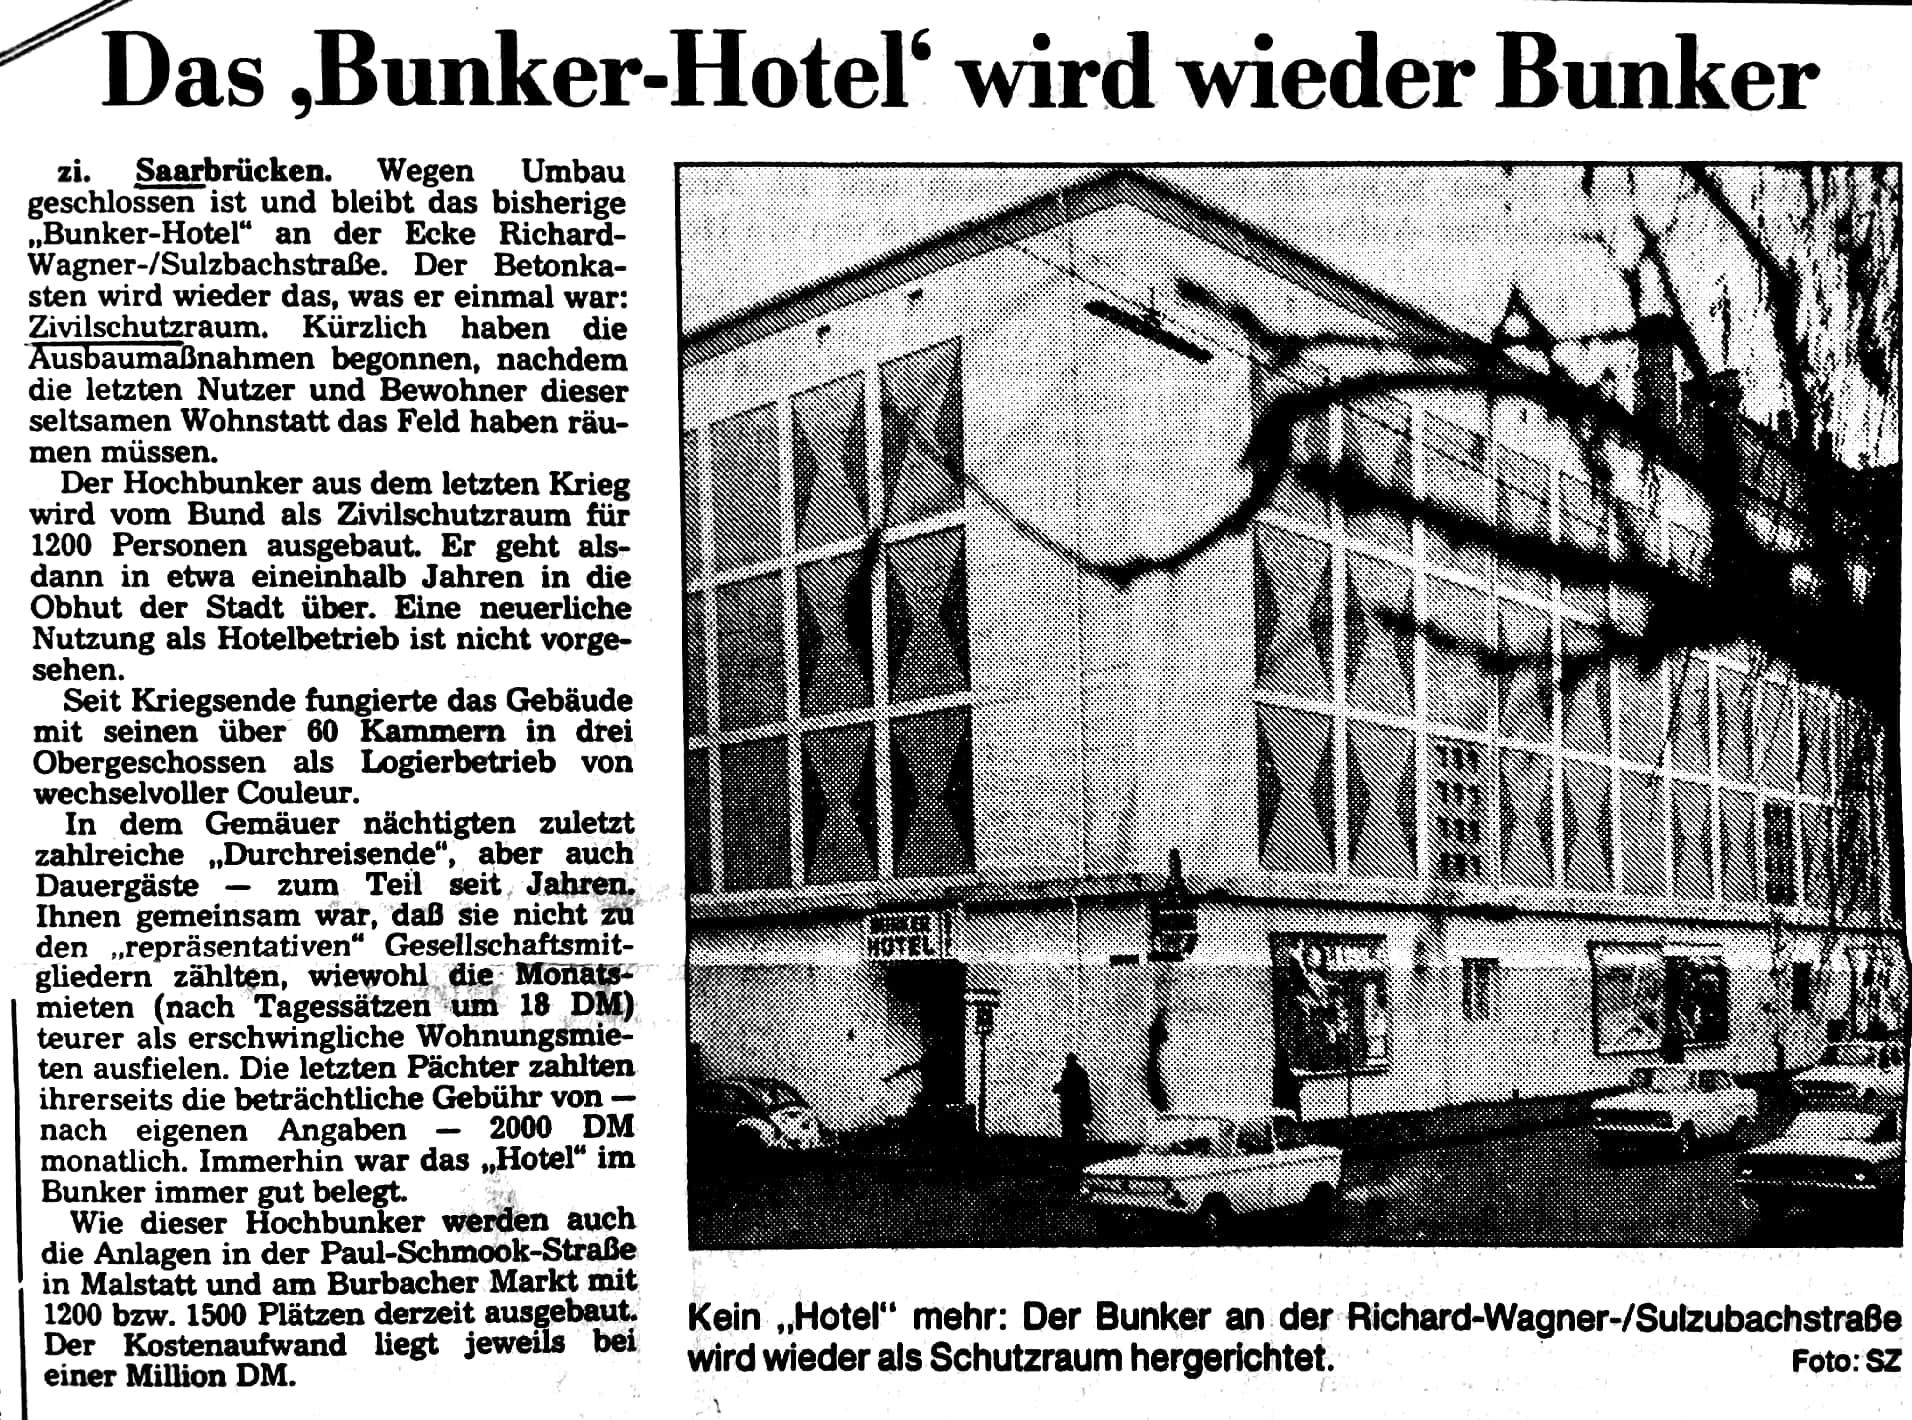 Das Bunkerhotel